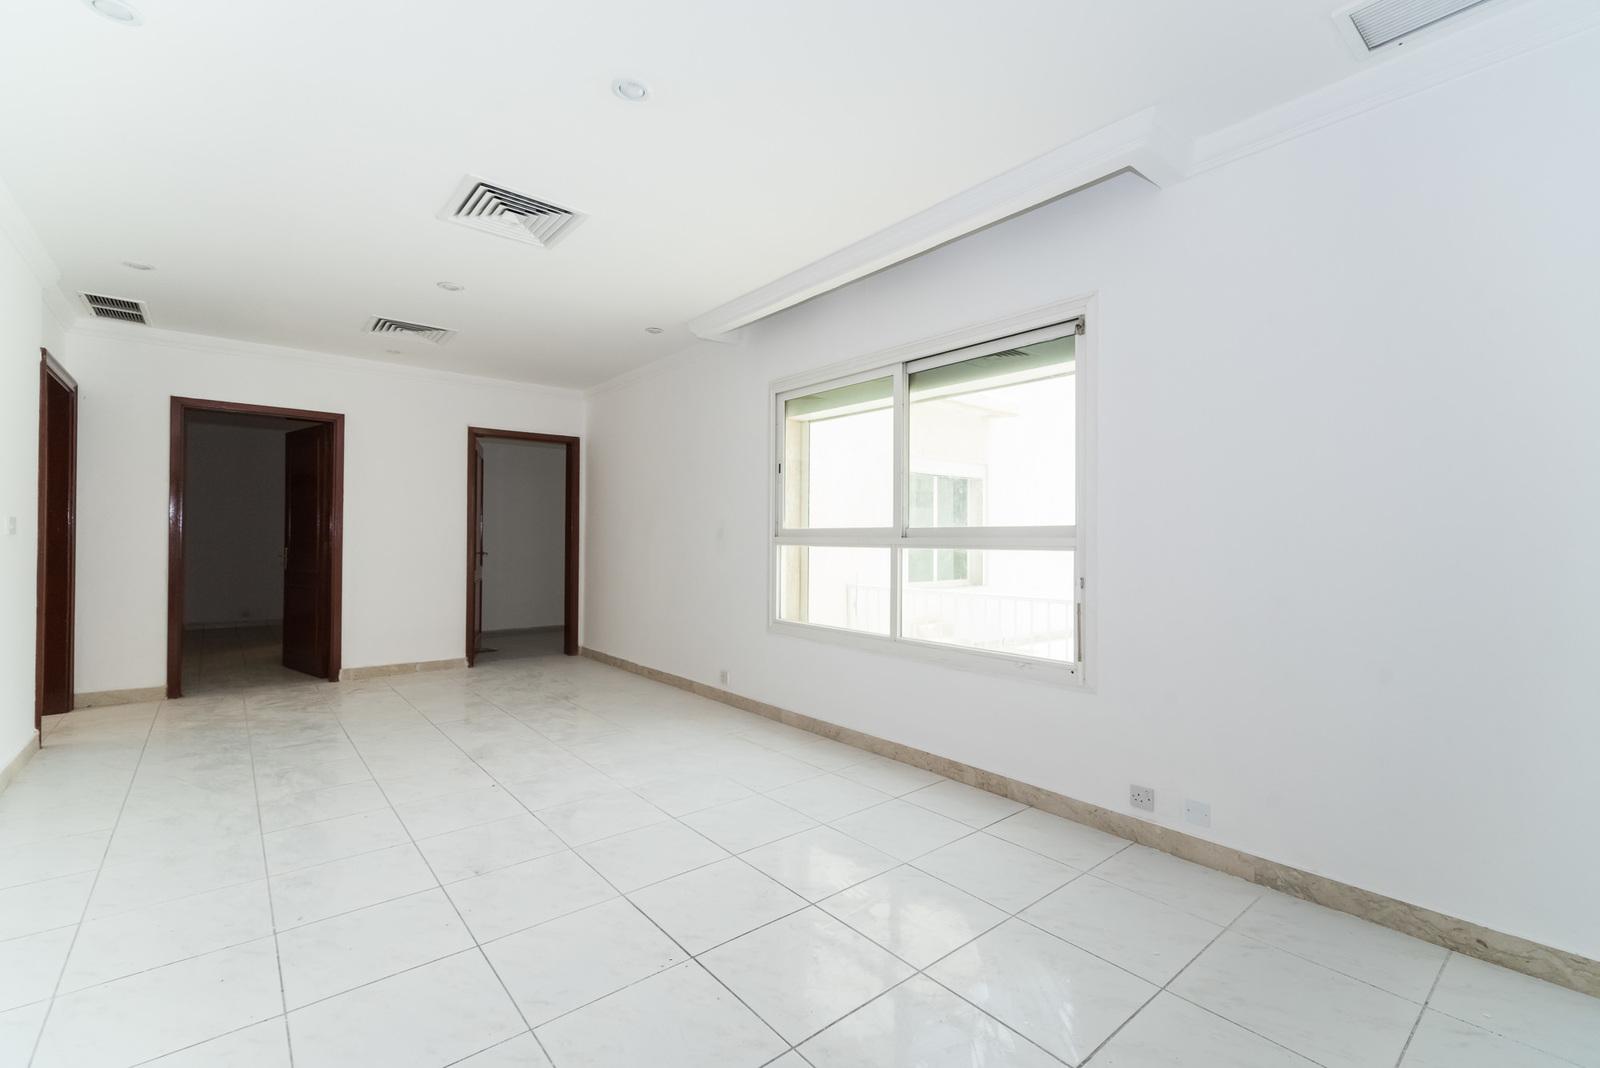 Zahra – unfurnished, six bedroom villa w/basement, preferably for commercial use